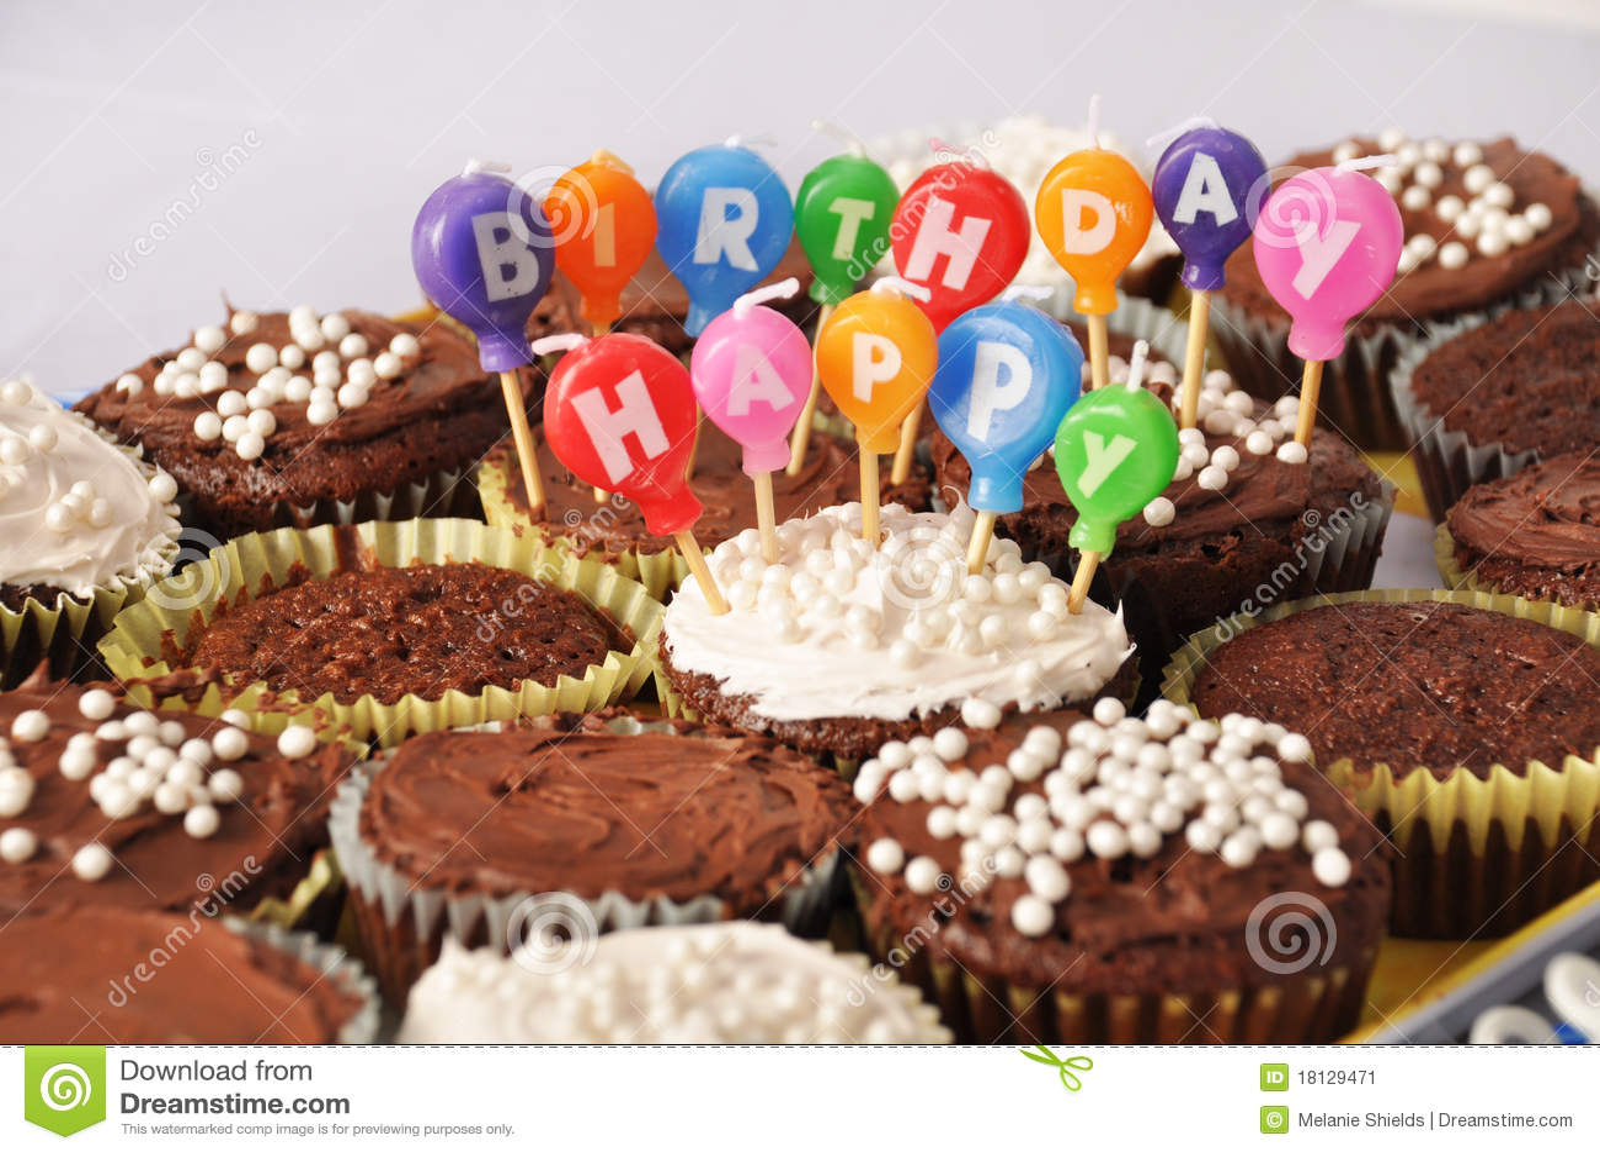 Happy Birthday Chocolate Cupcakes   www.galleryhip.com - The Hippest ...